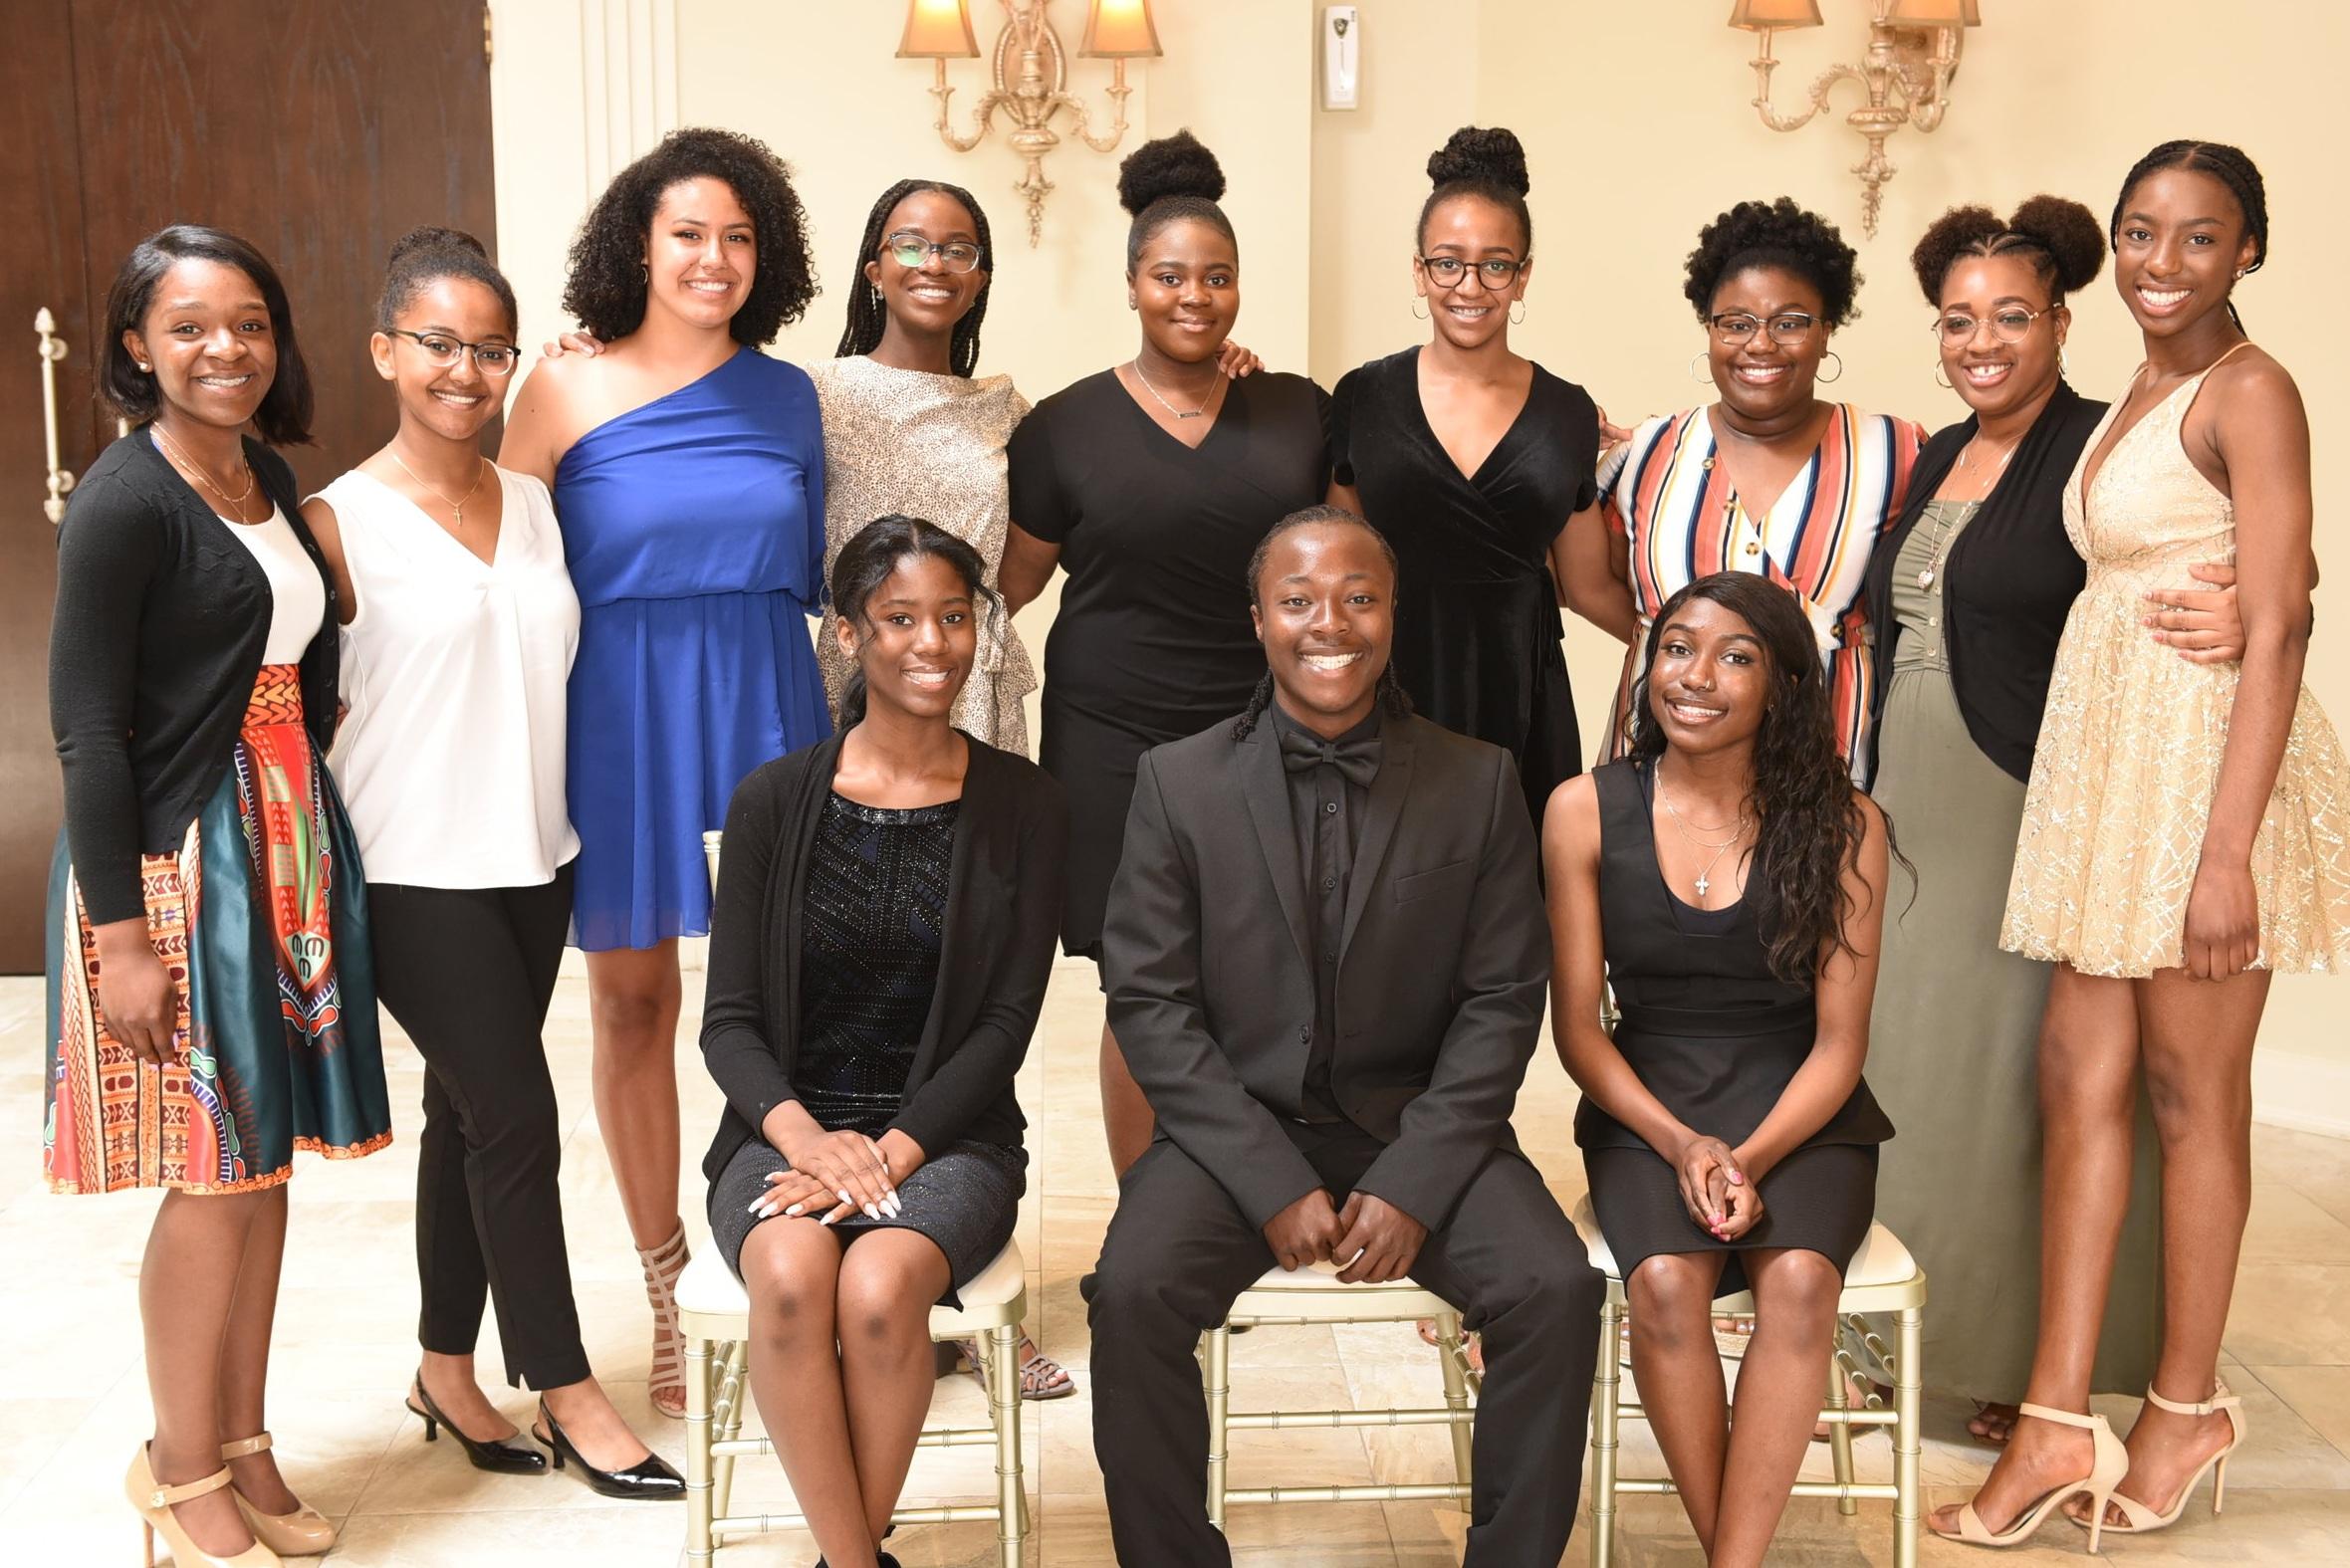 Congress of Black Women (Mississauga & Area chapter) scholarship winners